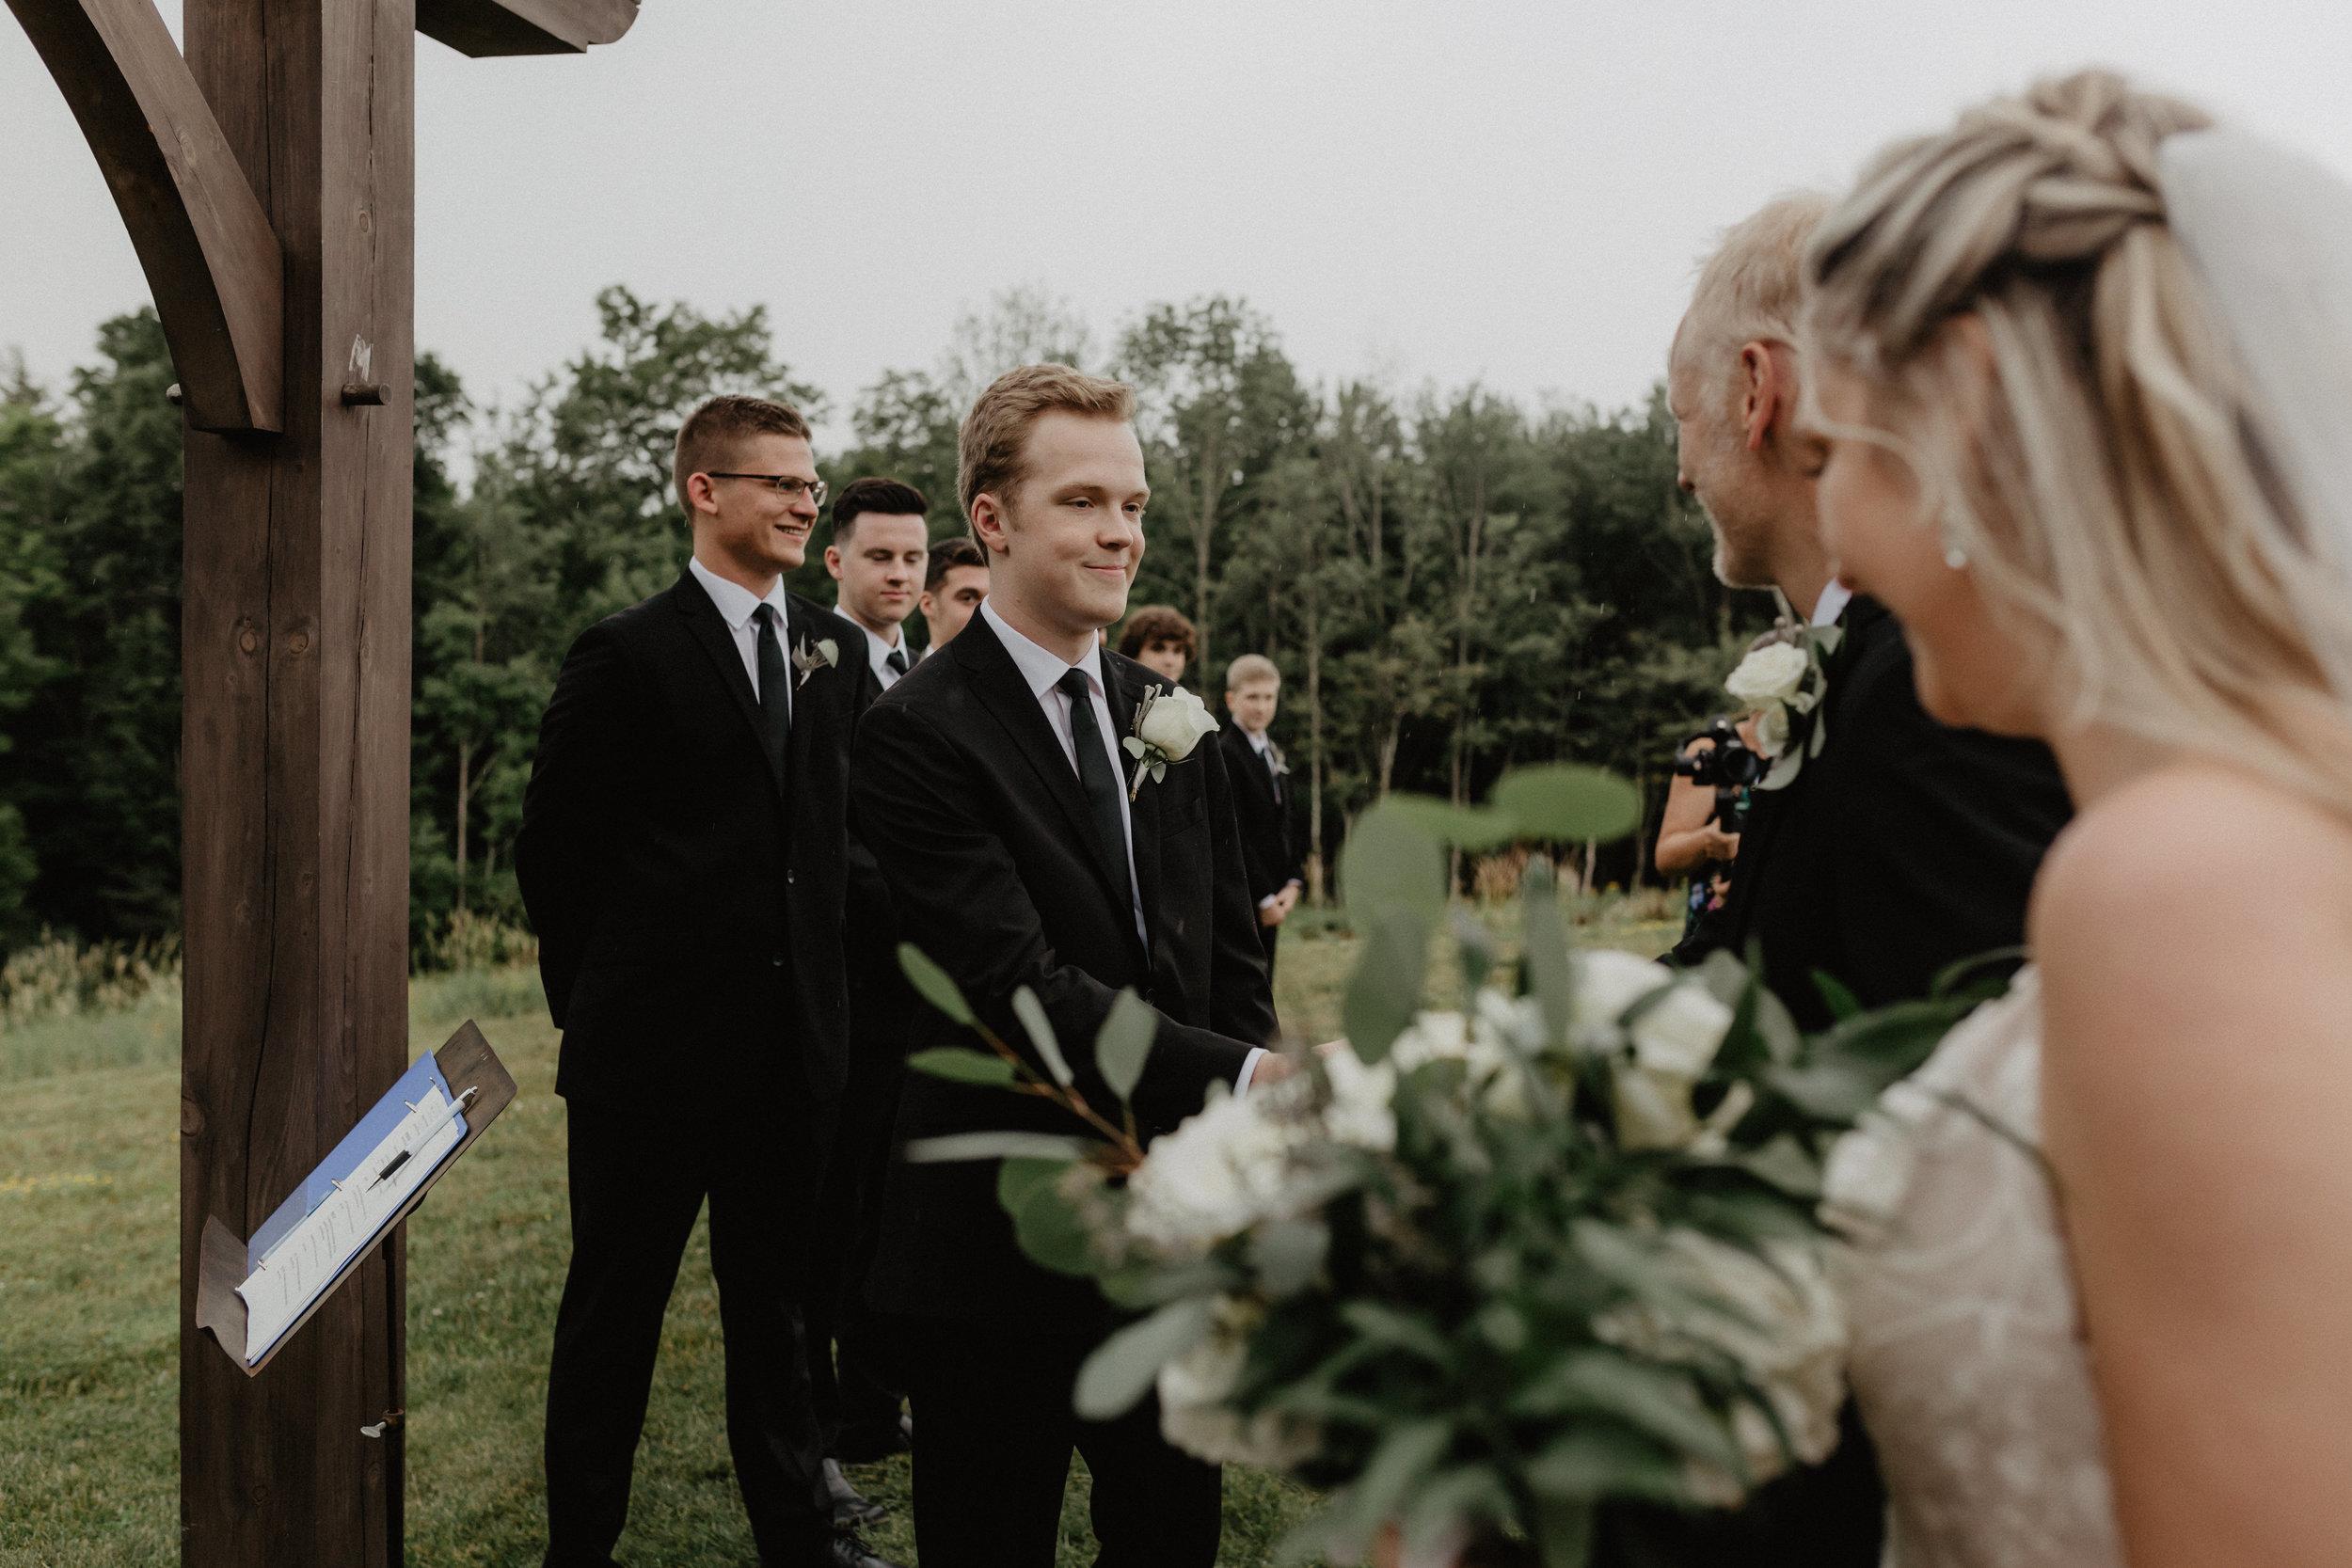 greywacke-meadows-wedding-28.jpg